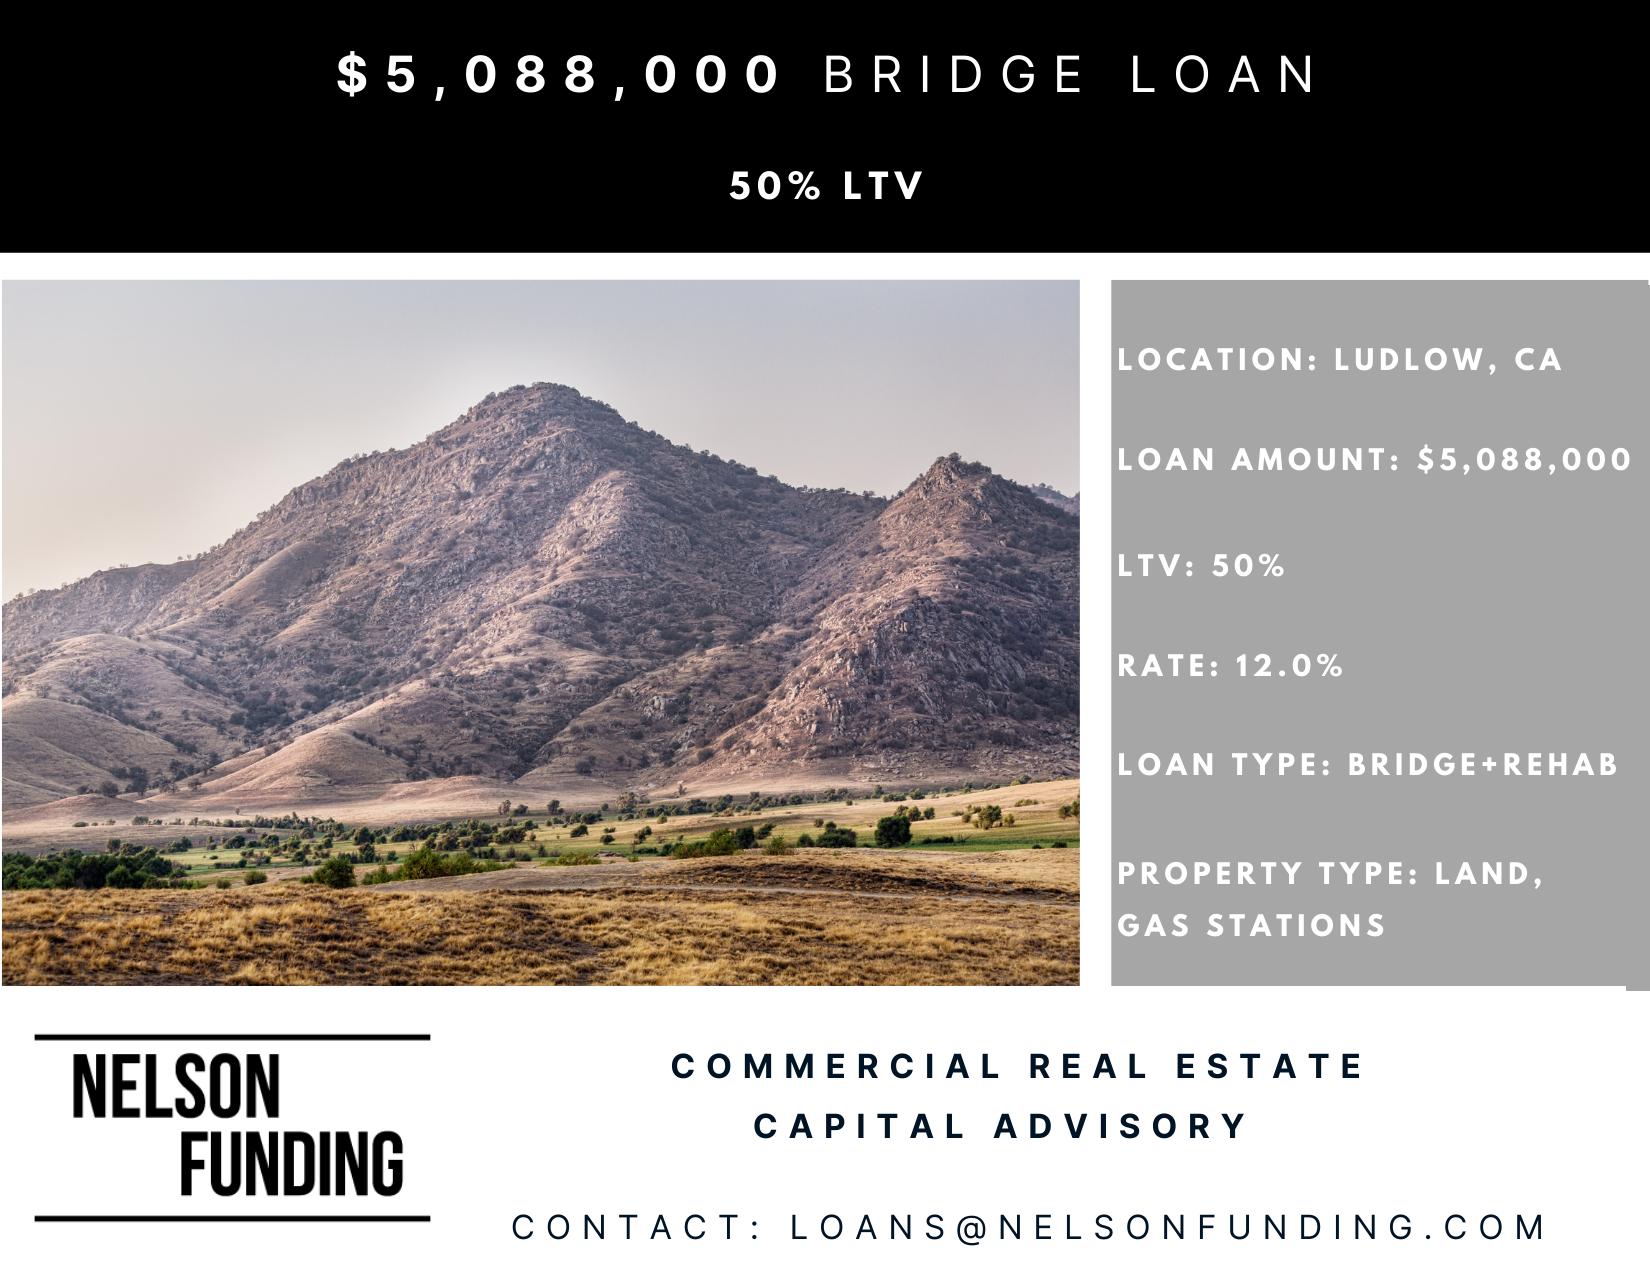 Closes $5,088,000 Bridge Loan in Ludlow, CA